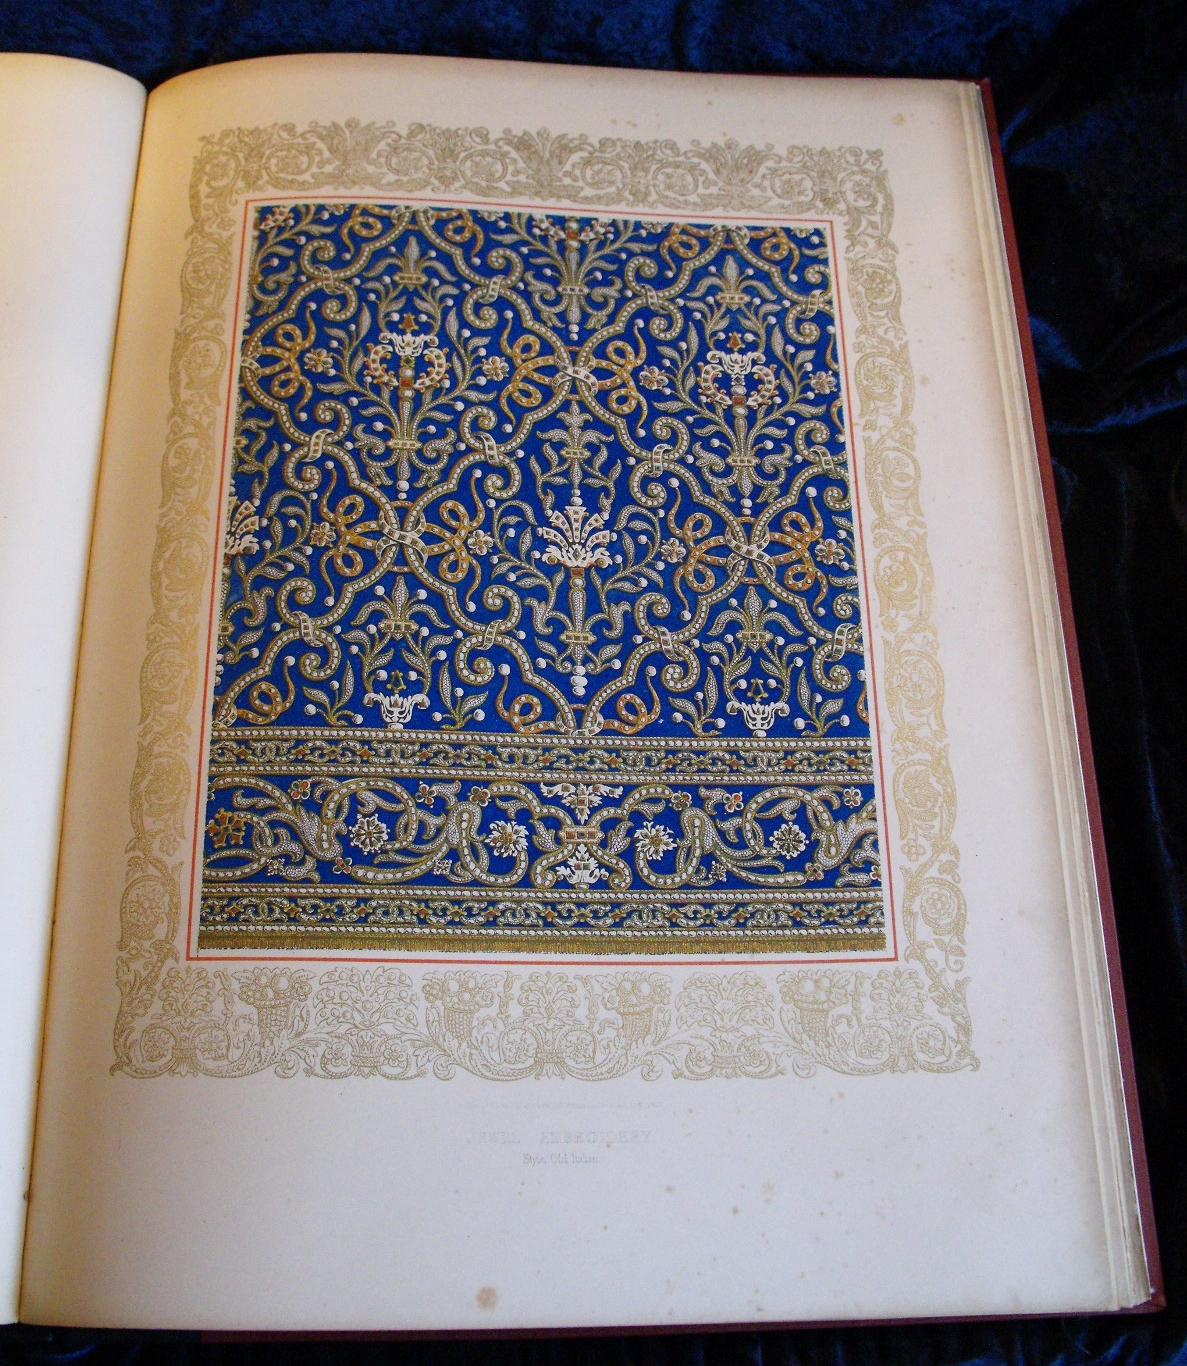 Studies of Ornamental Design: Richardson, (Charles James)